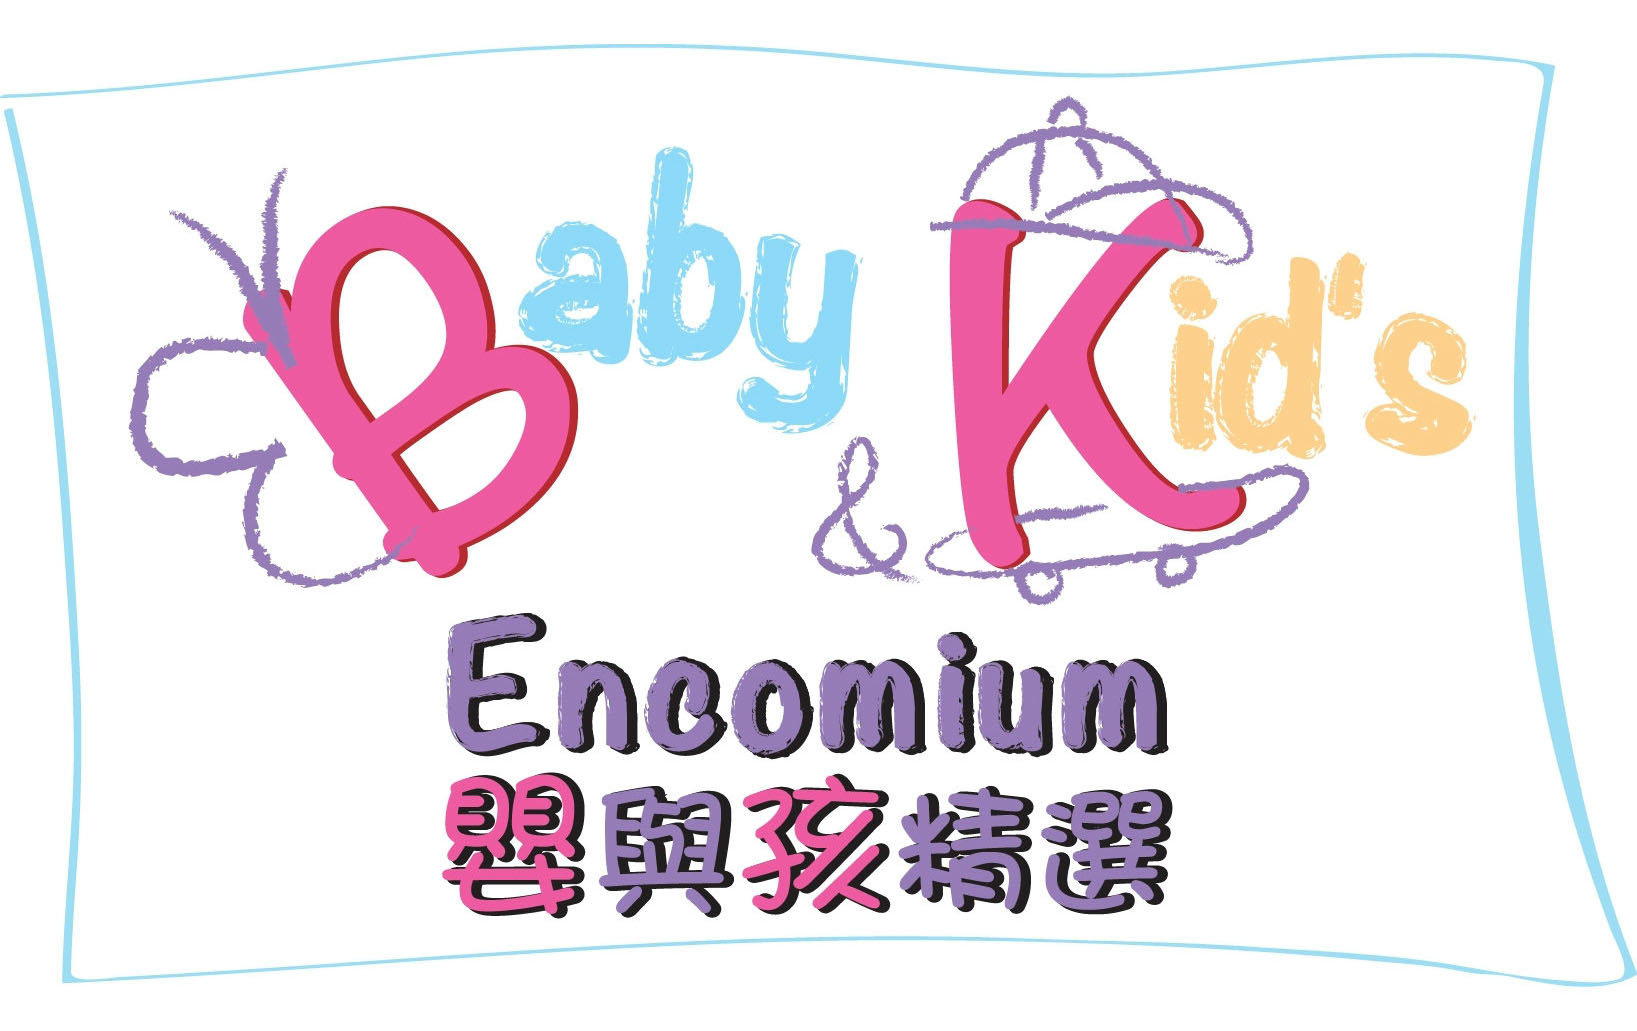 babykids-logoa.jpg